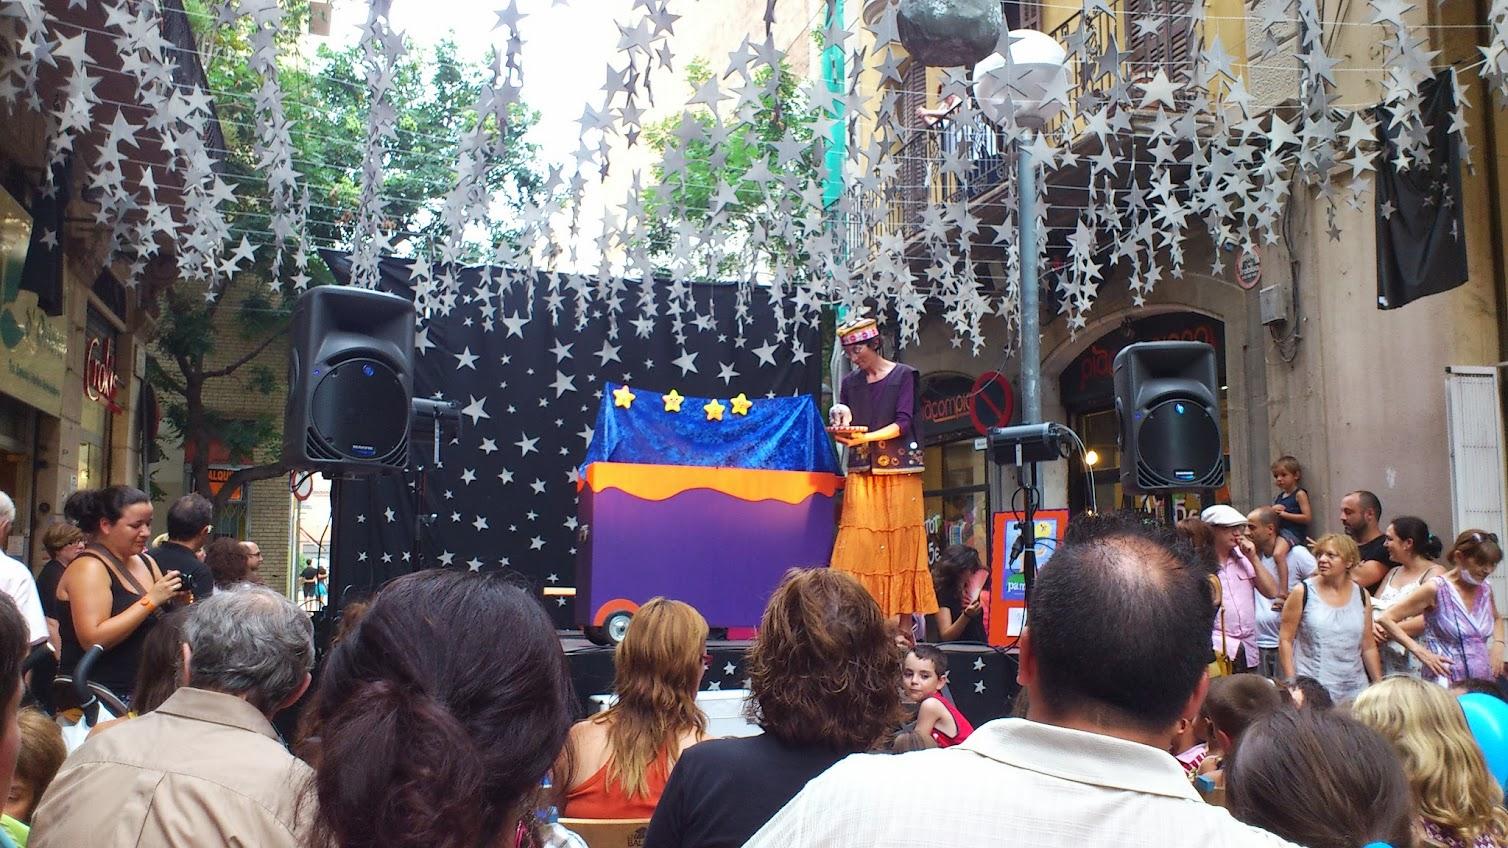 Pamipipa a les festes de Gràcia